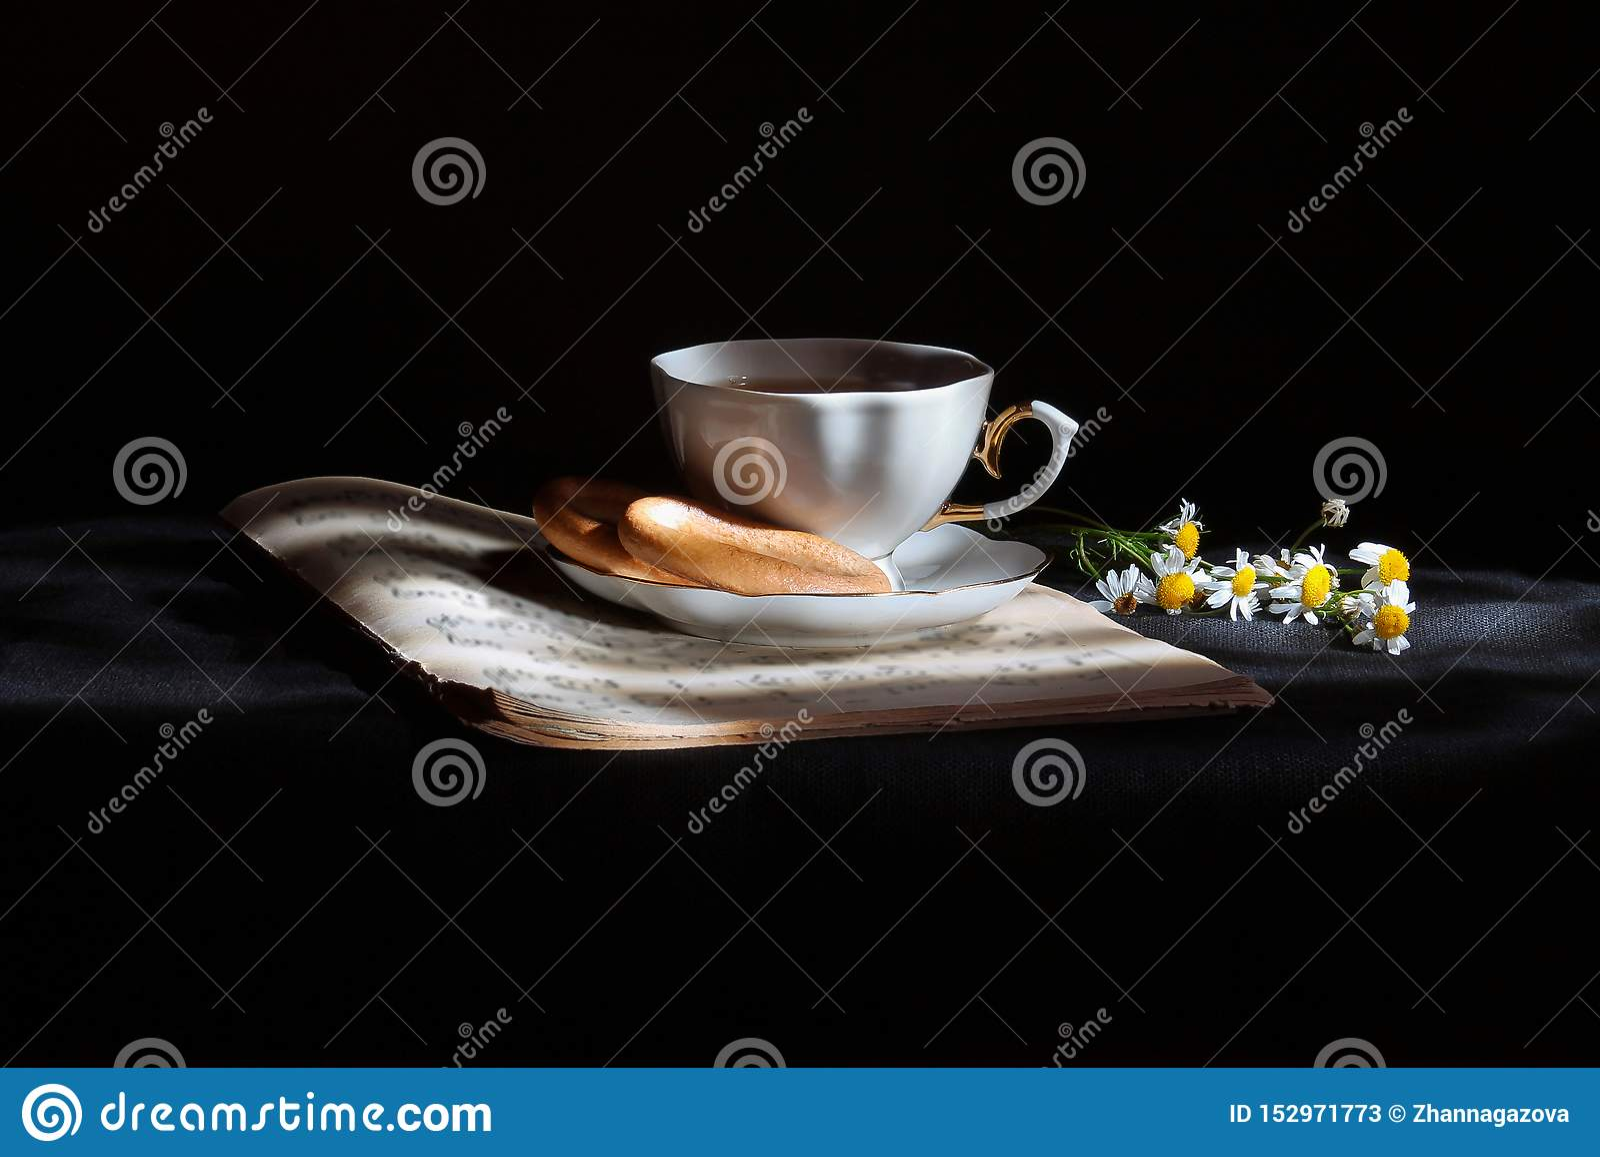 Kop thee met madeliefjes